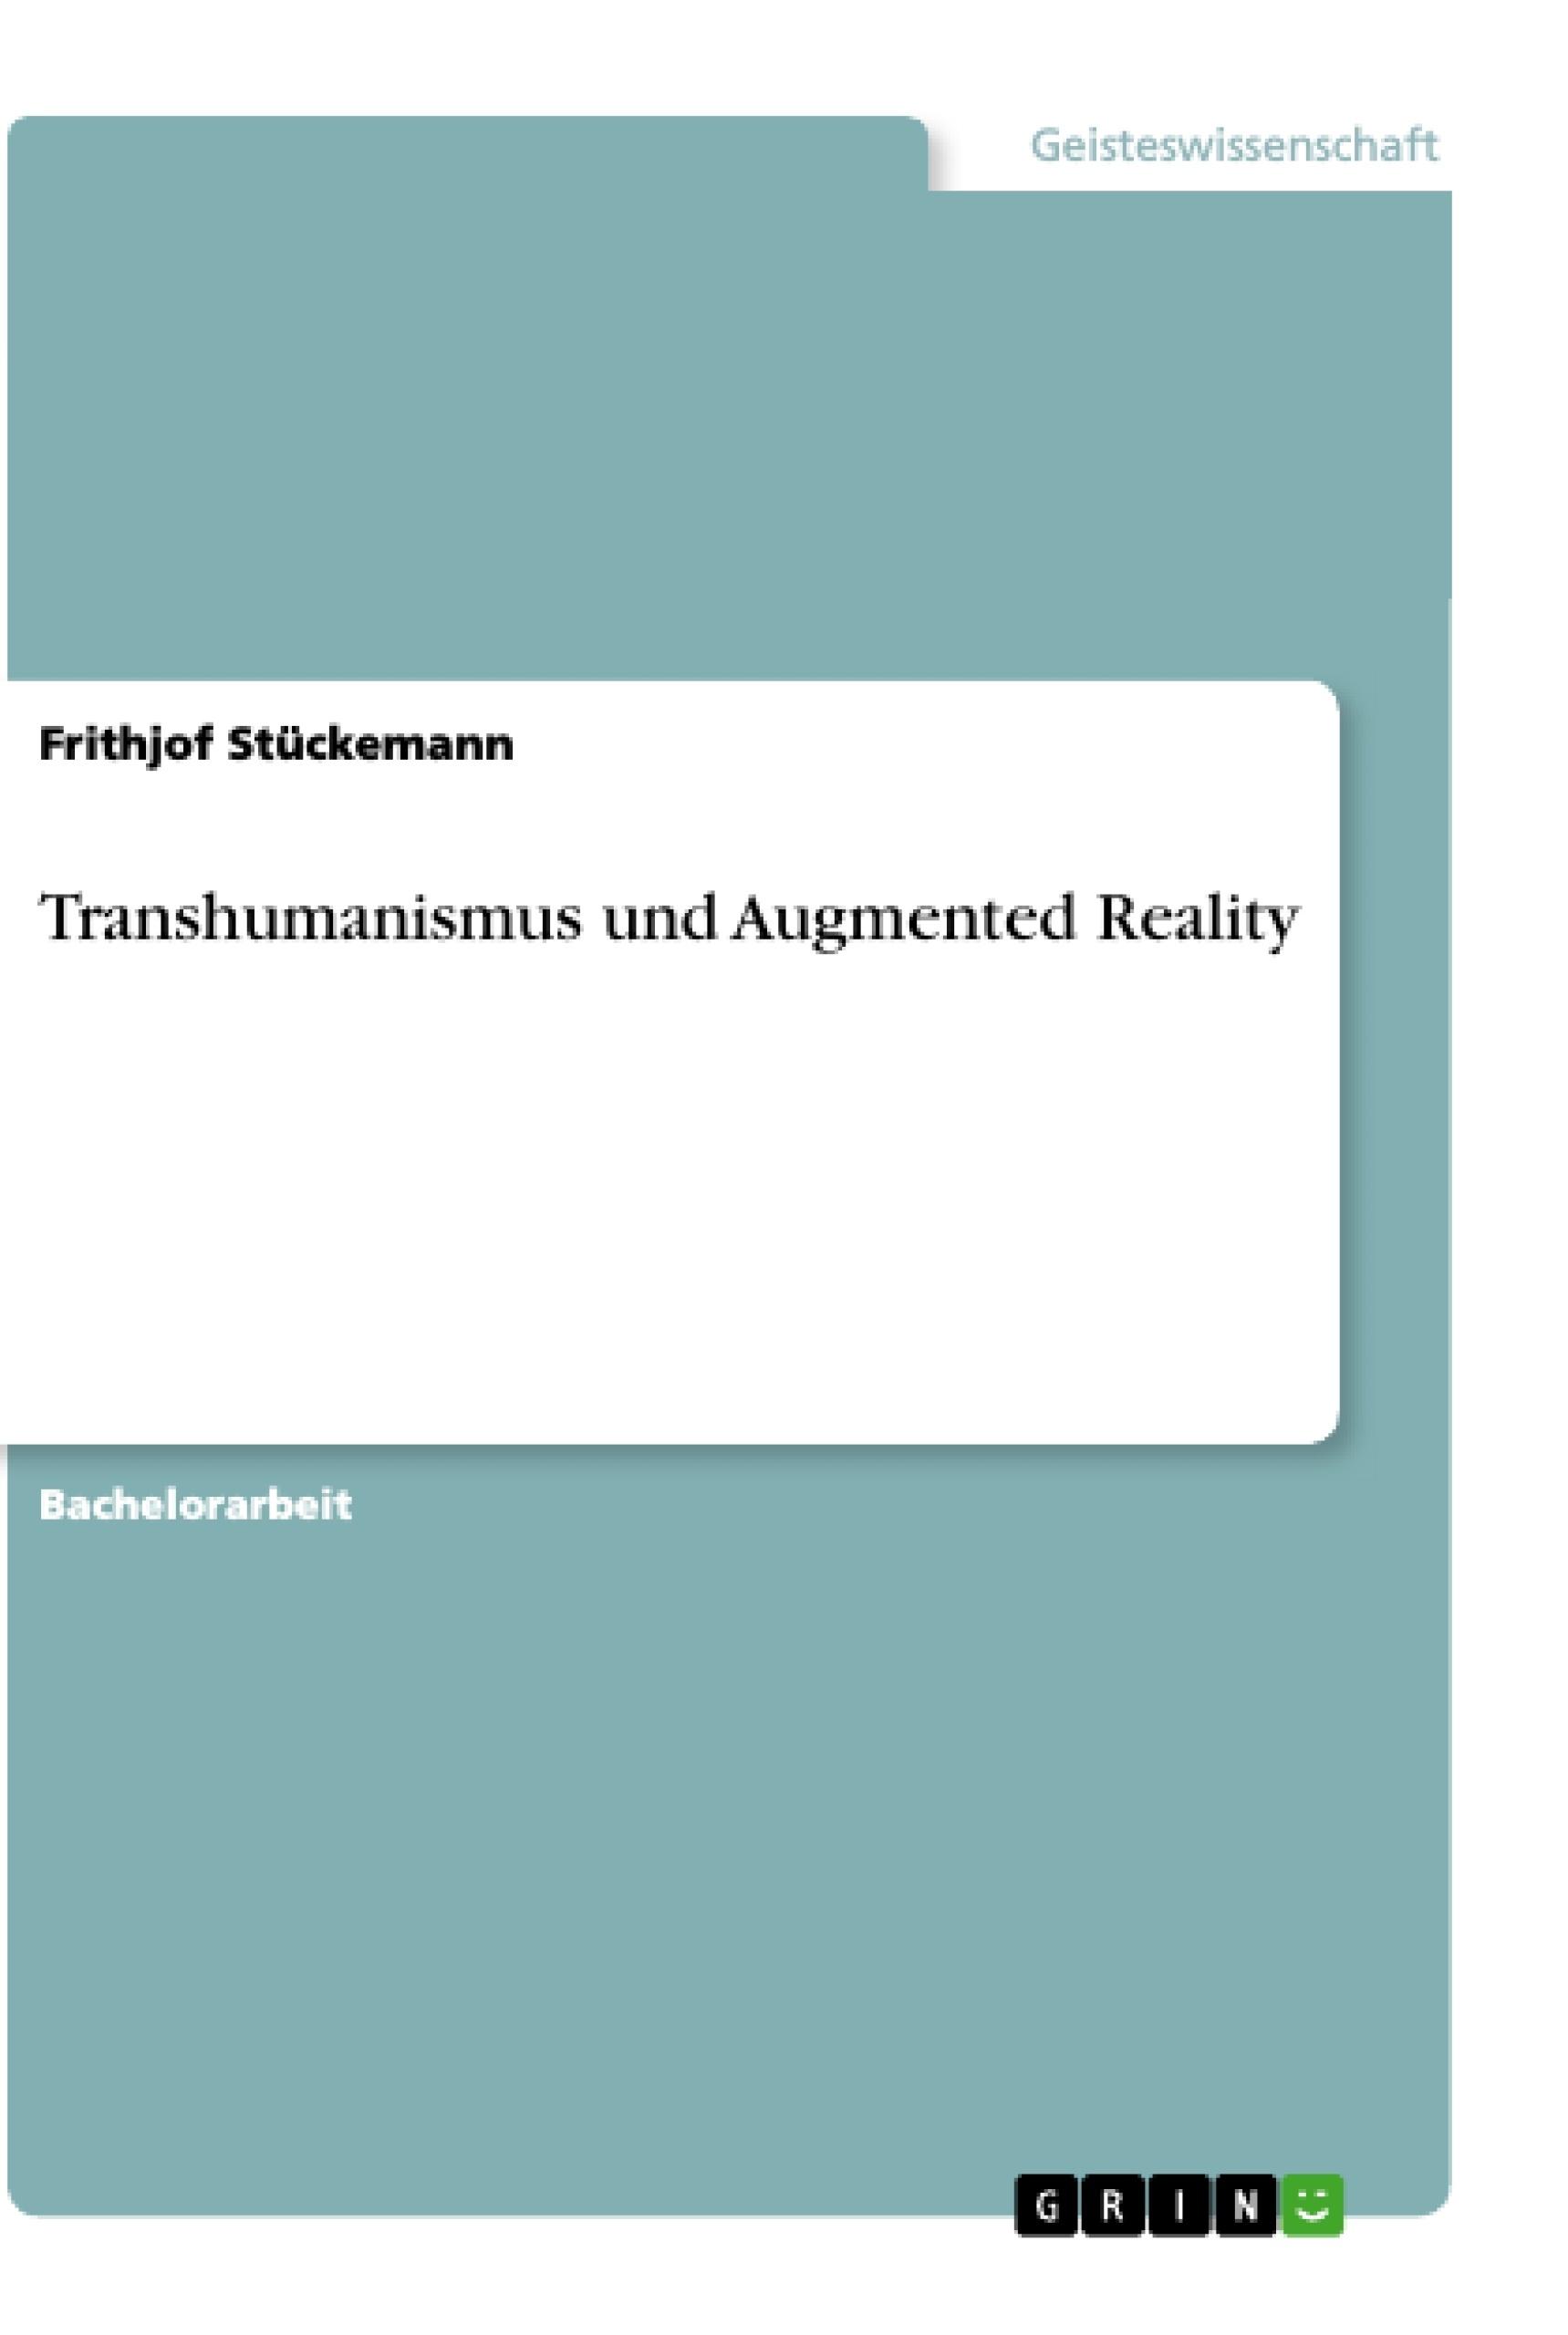 Titel: Transhumanismus und Augmented Reality